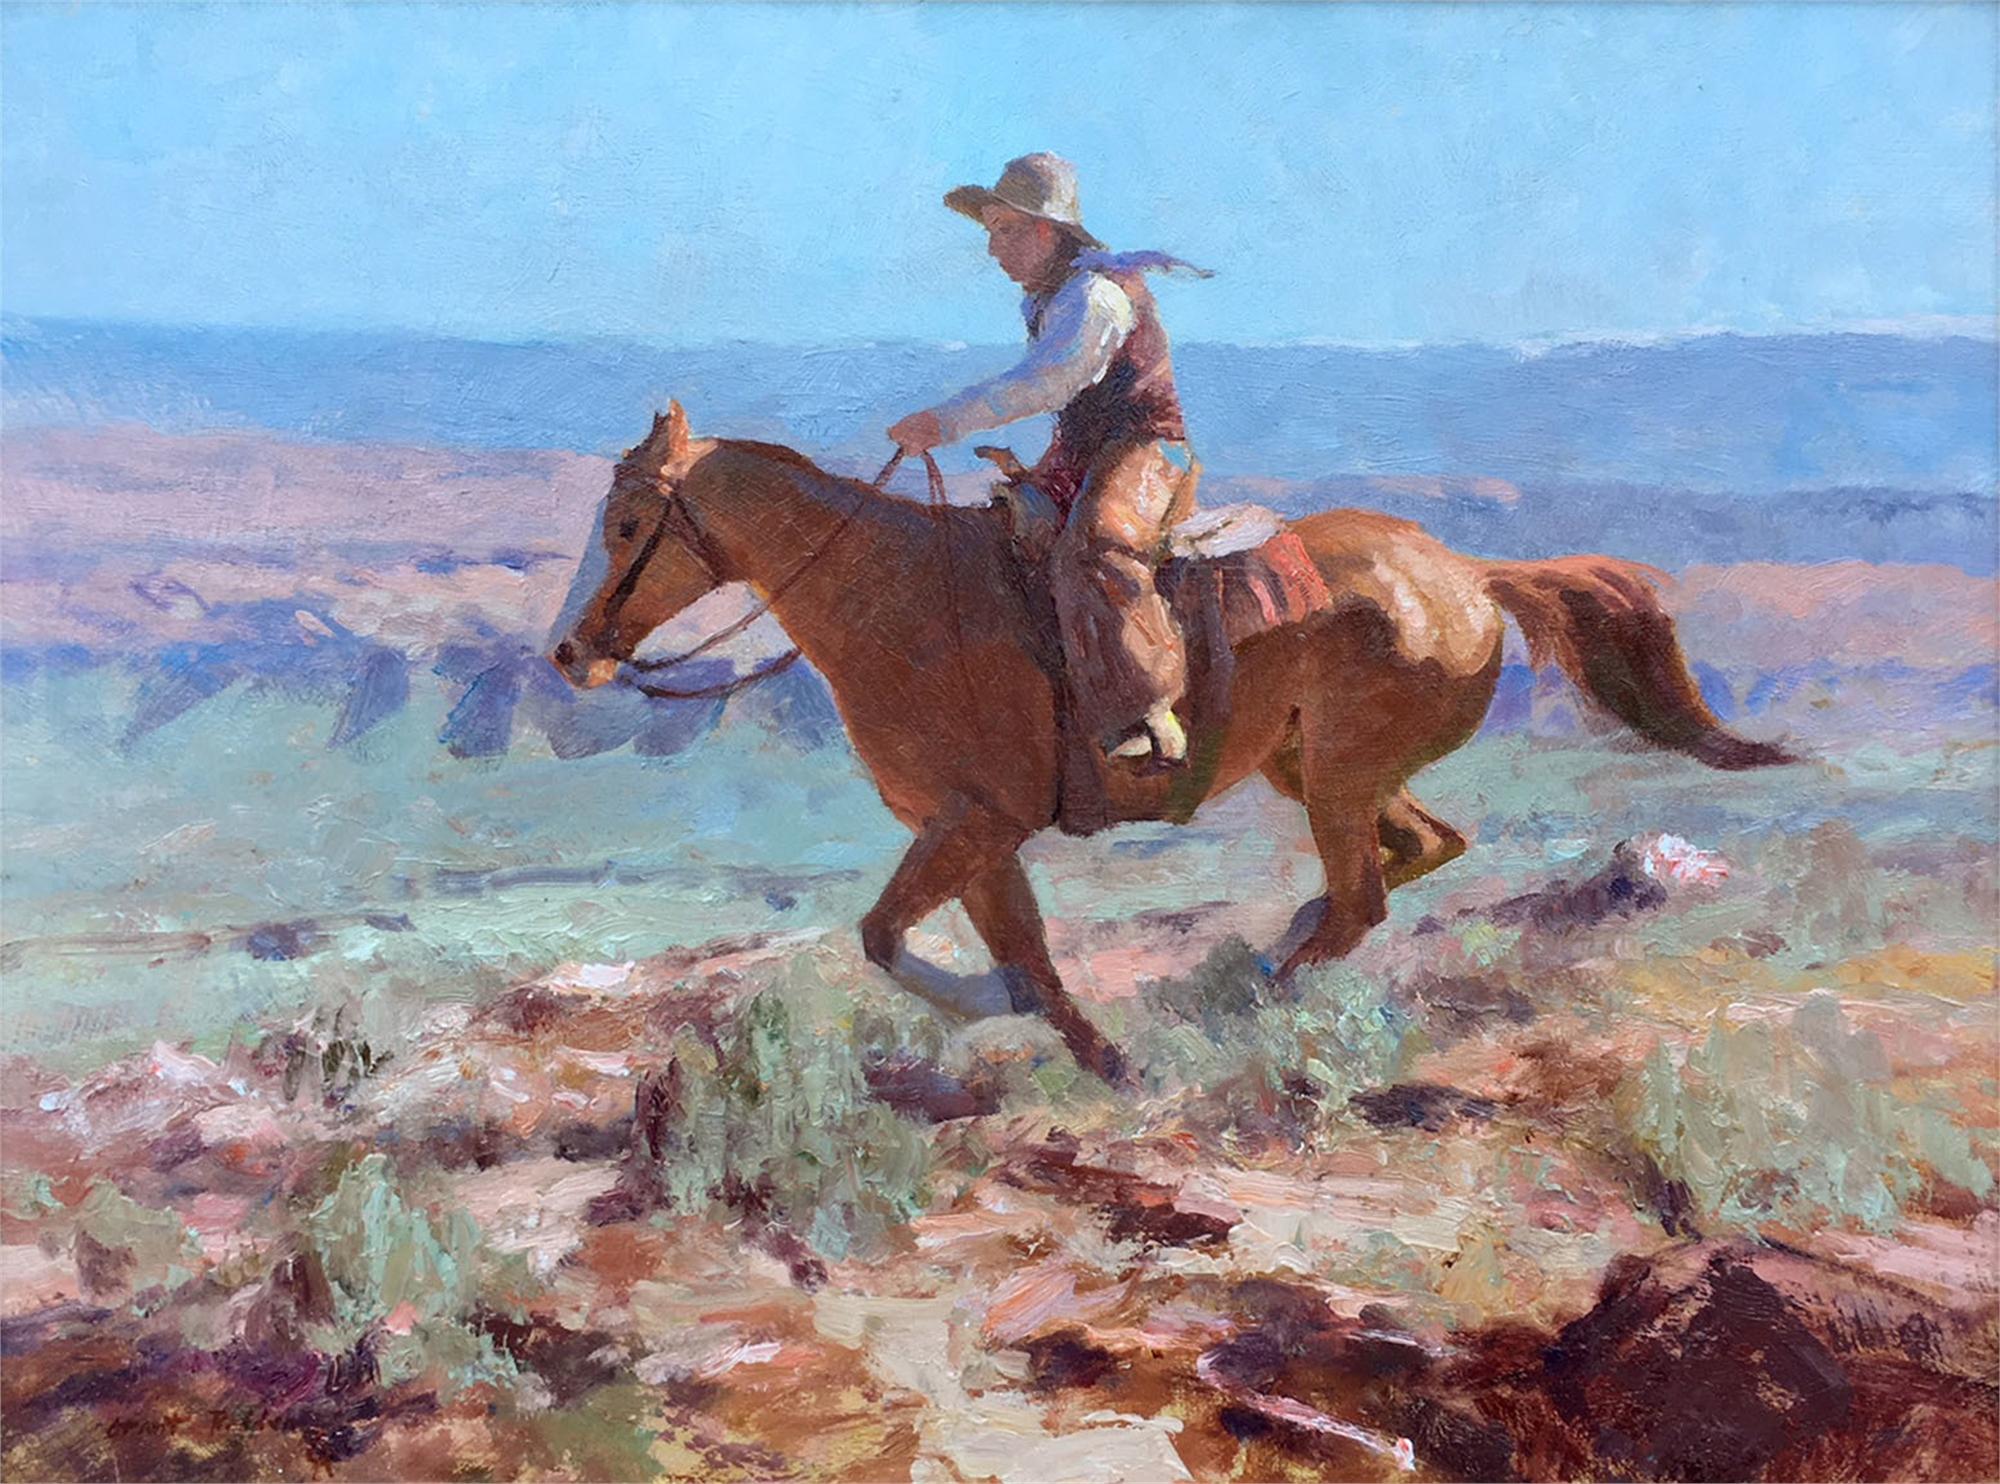 Spanish Trail by Grant Redden